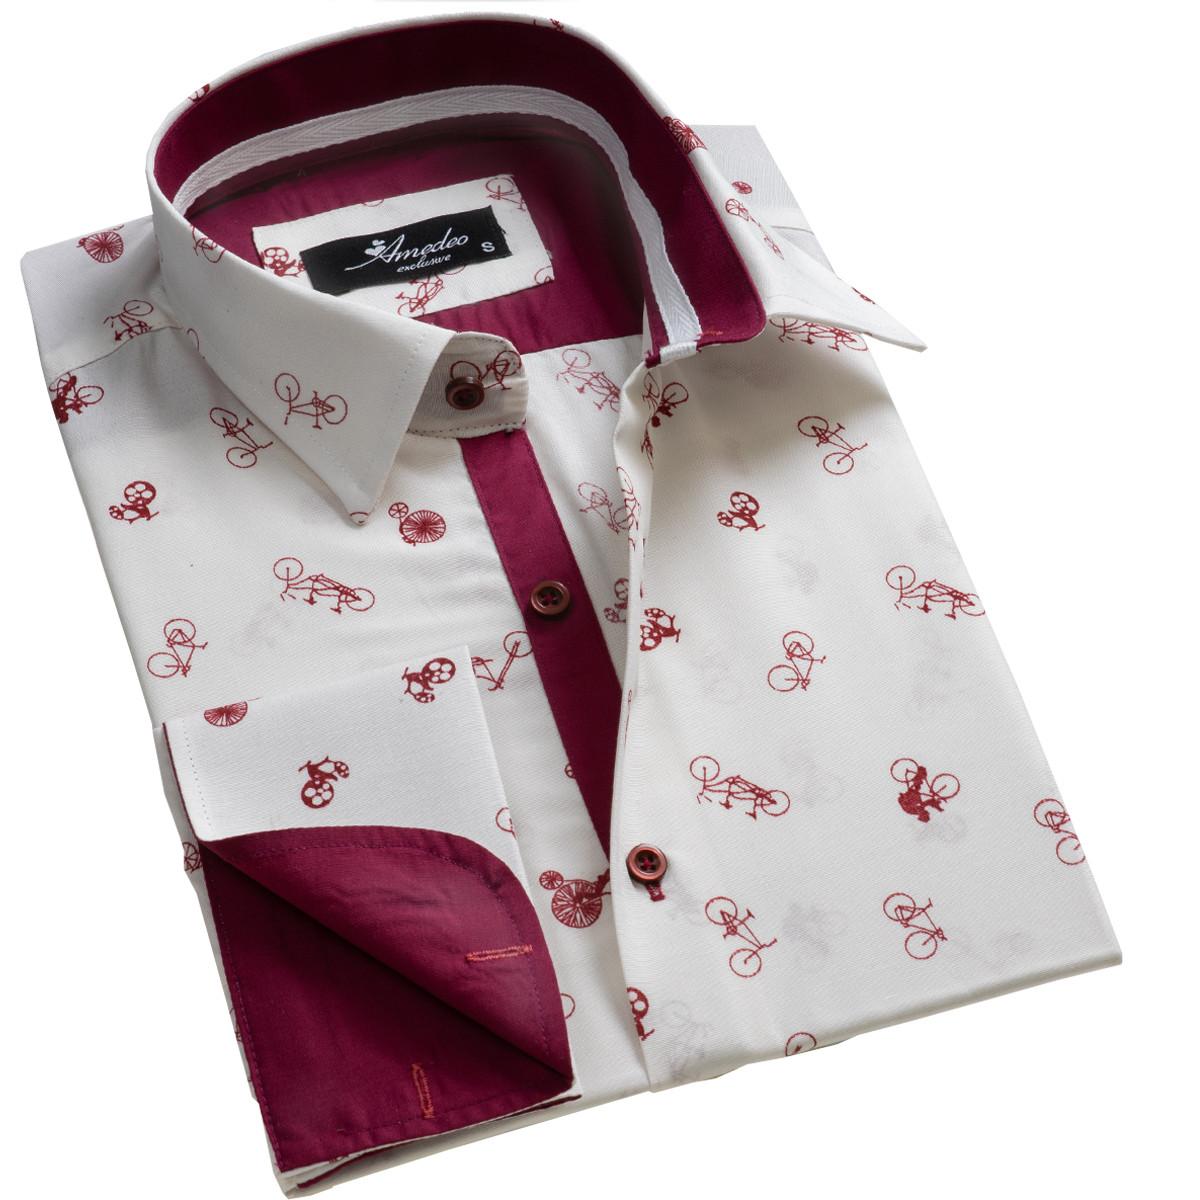 European Made & Designed Reversible Cuff Premium French Cuff Dress Shirt - white & burgundy